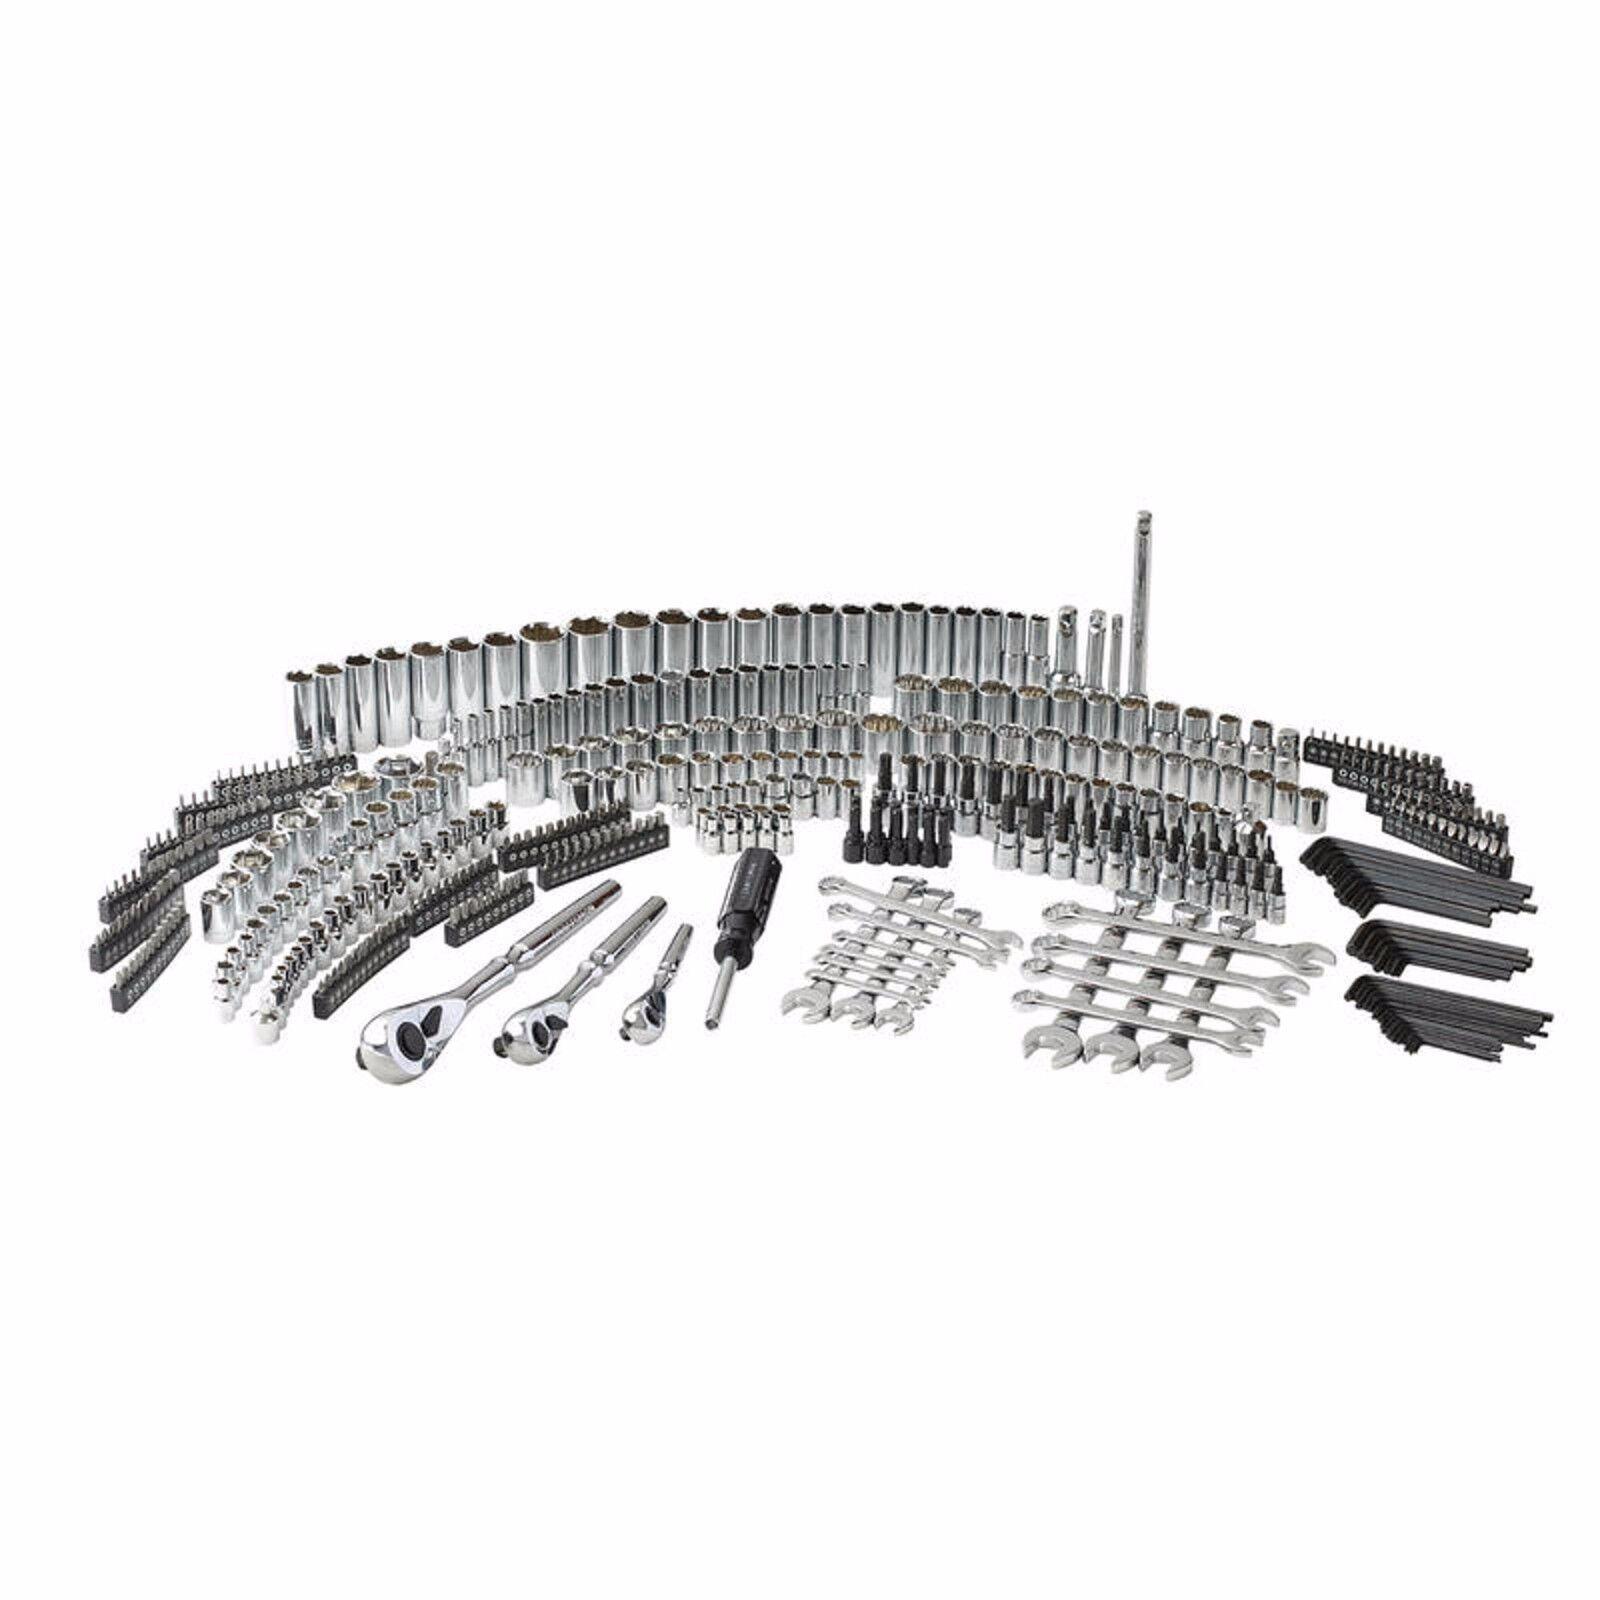 Craftsman 450 Piece Mechanic's Tool Set With 3 Drawer Case Box 99040 254 230 2